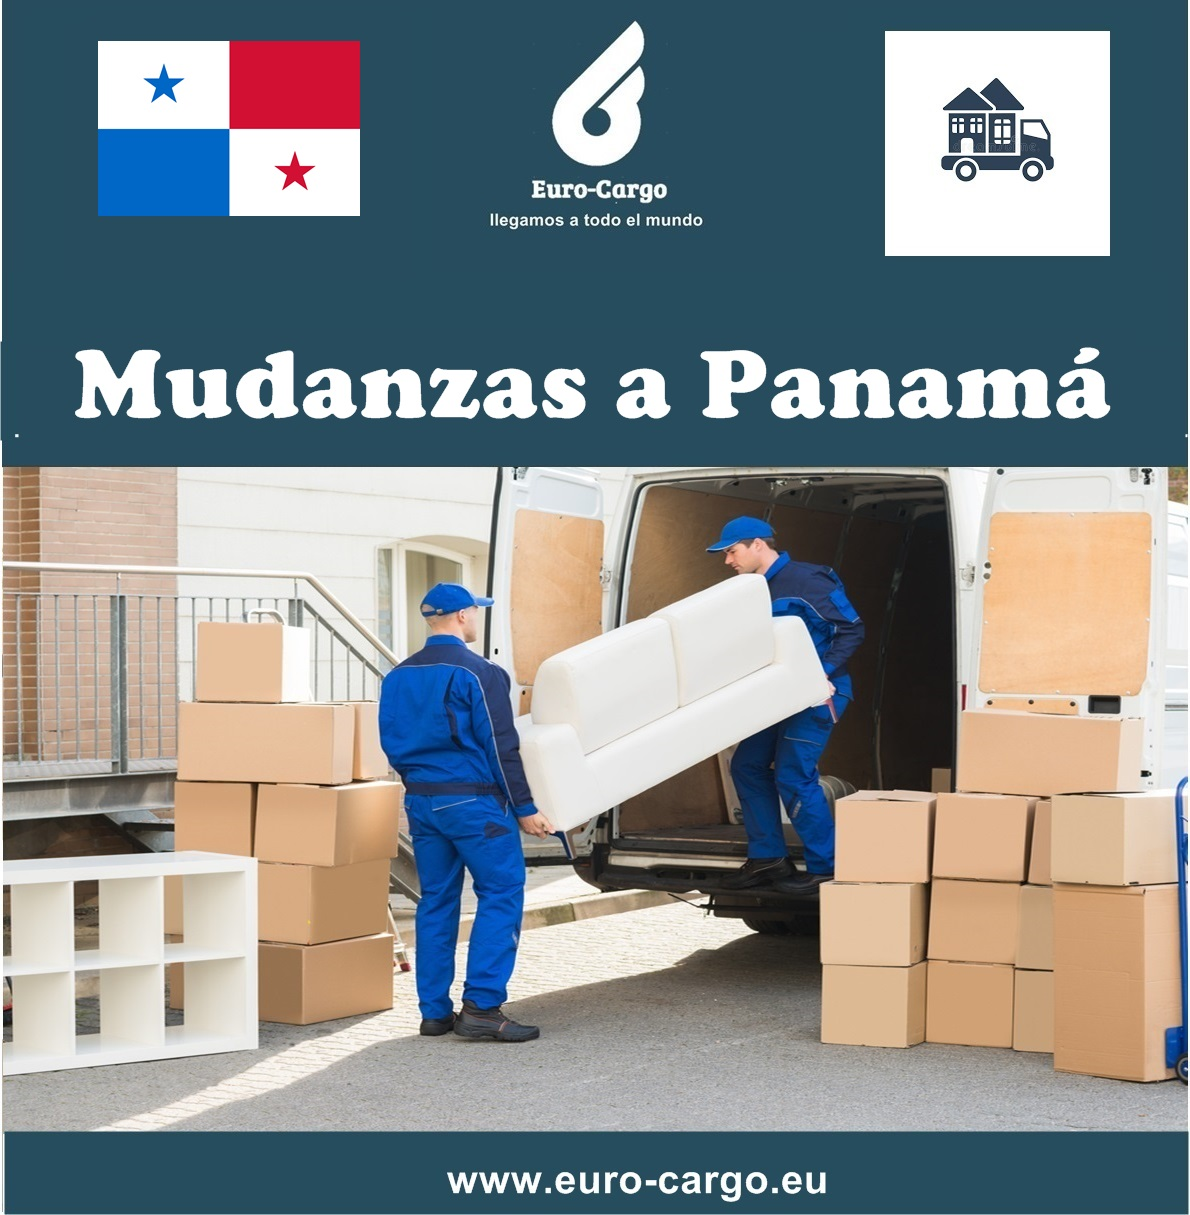 Mudanzas-a-Panama.jpg